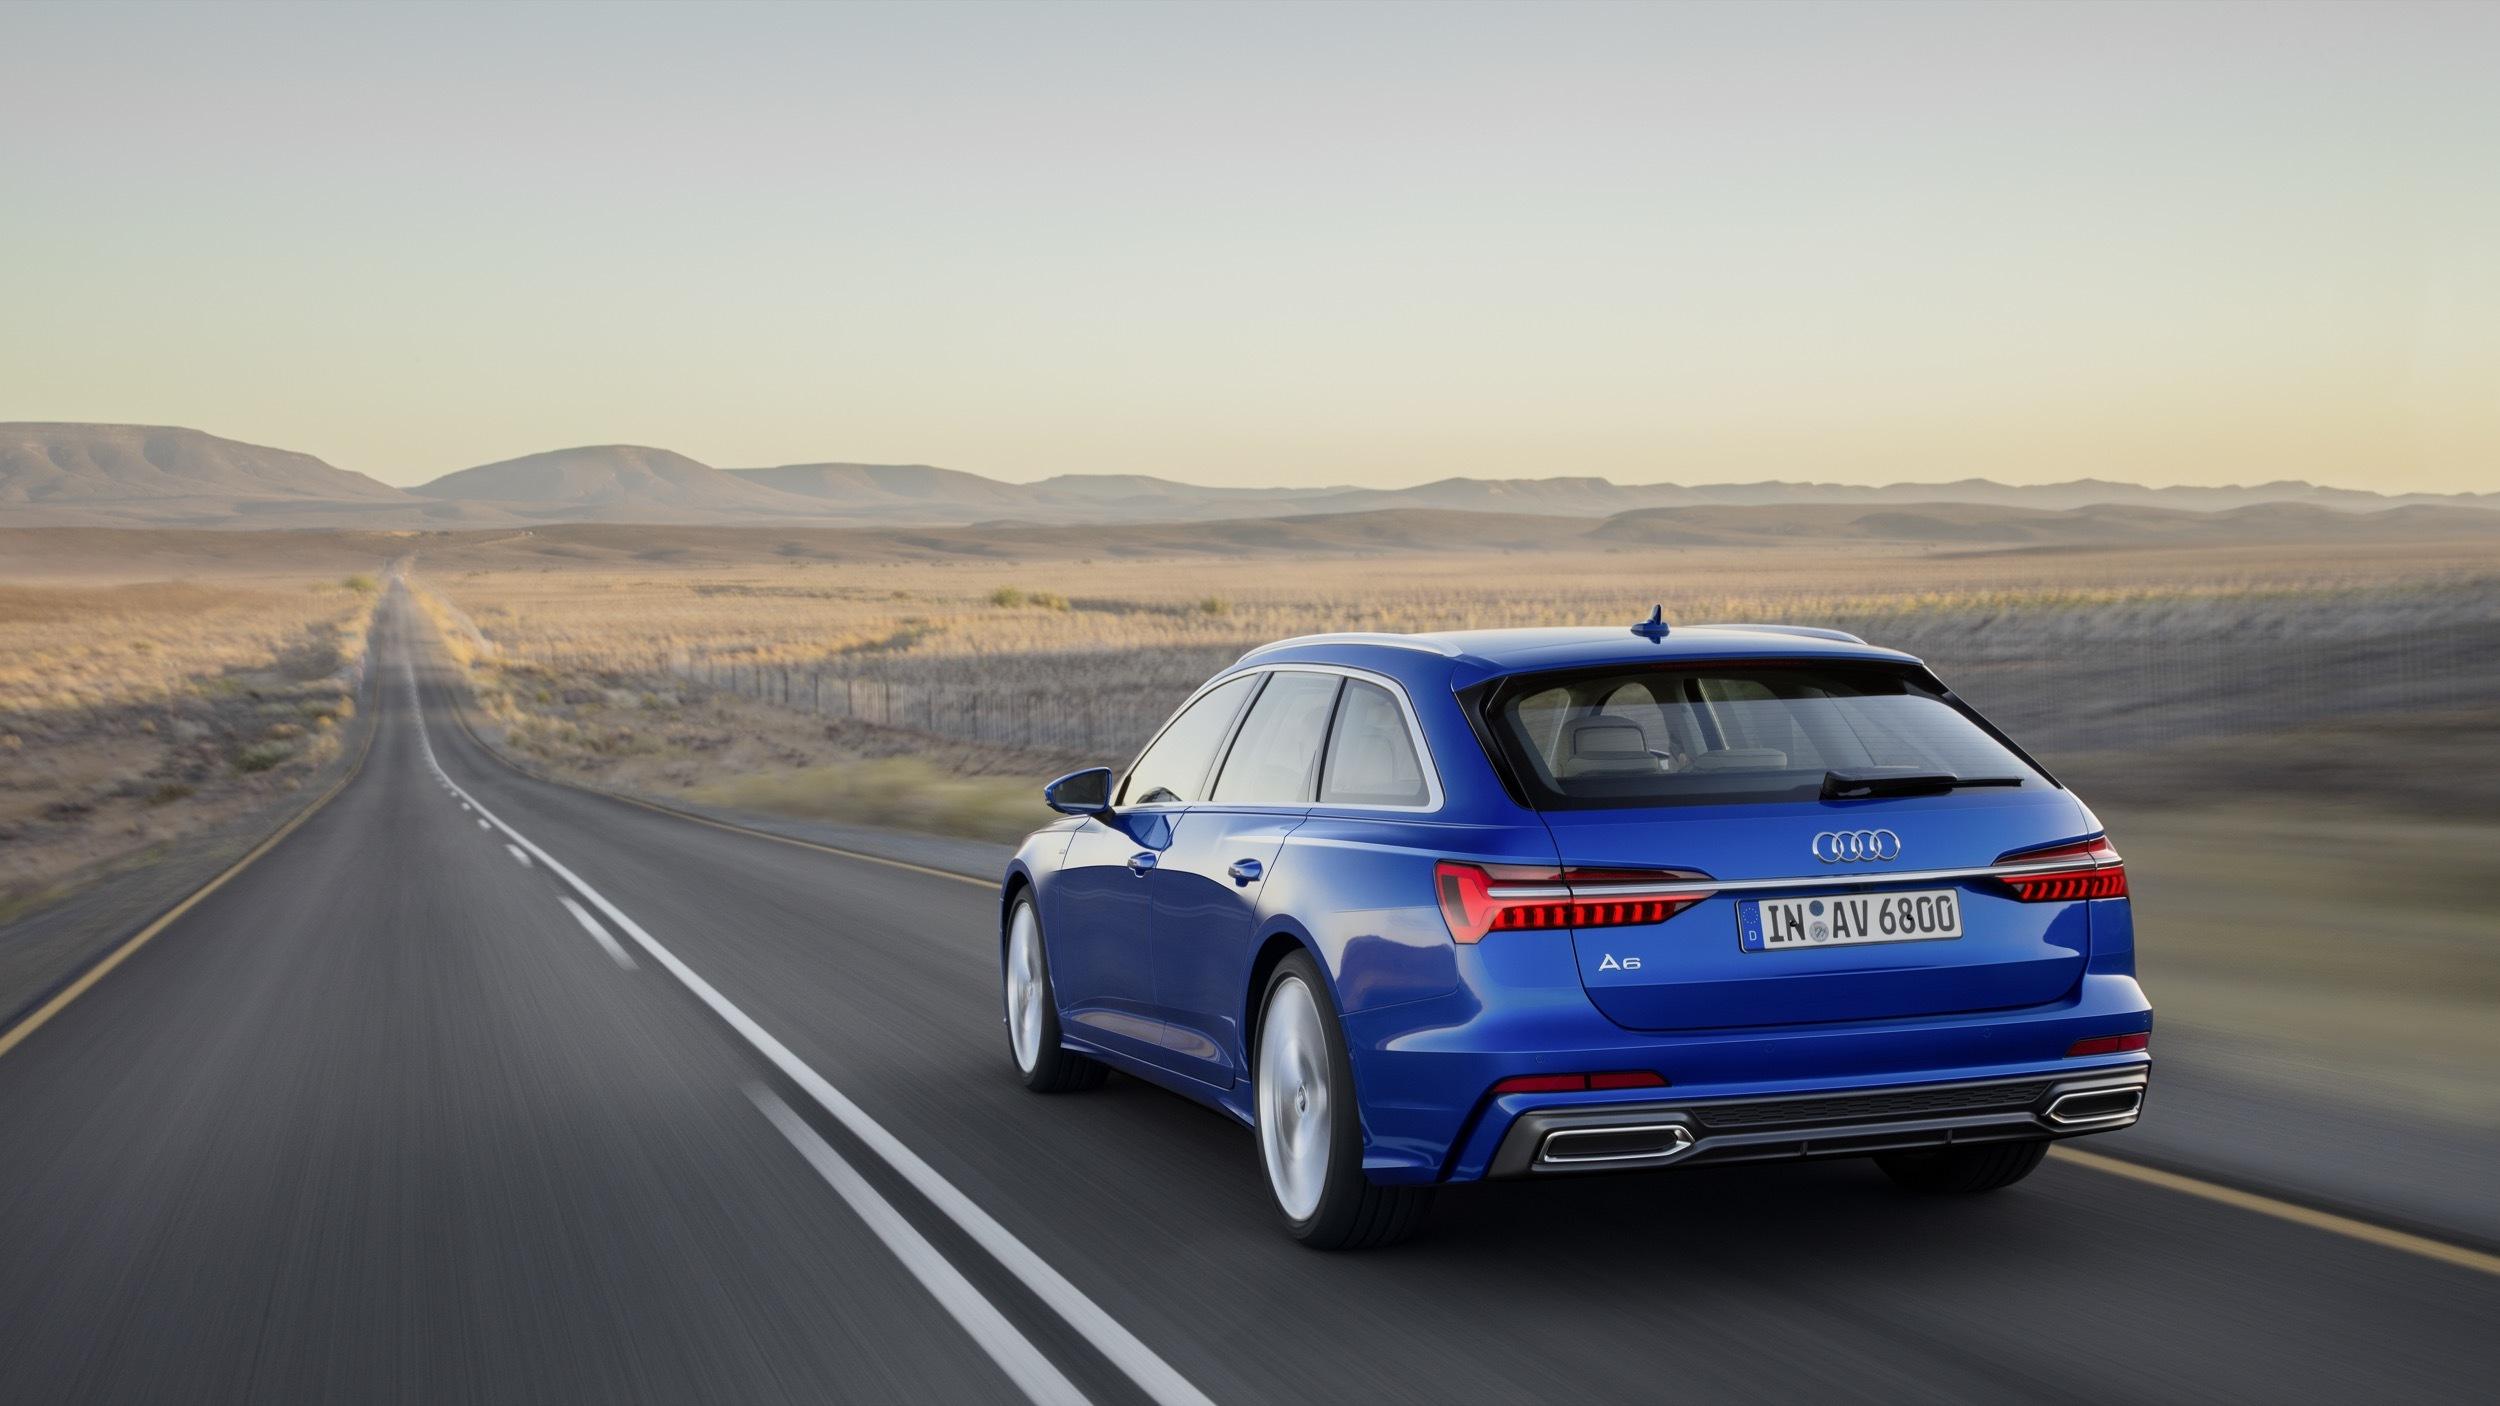 Ufficiale Audi A6 Avant 2018 Bmwnews